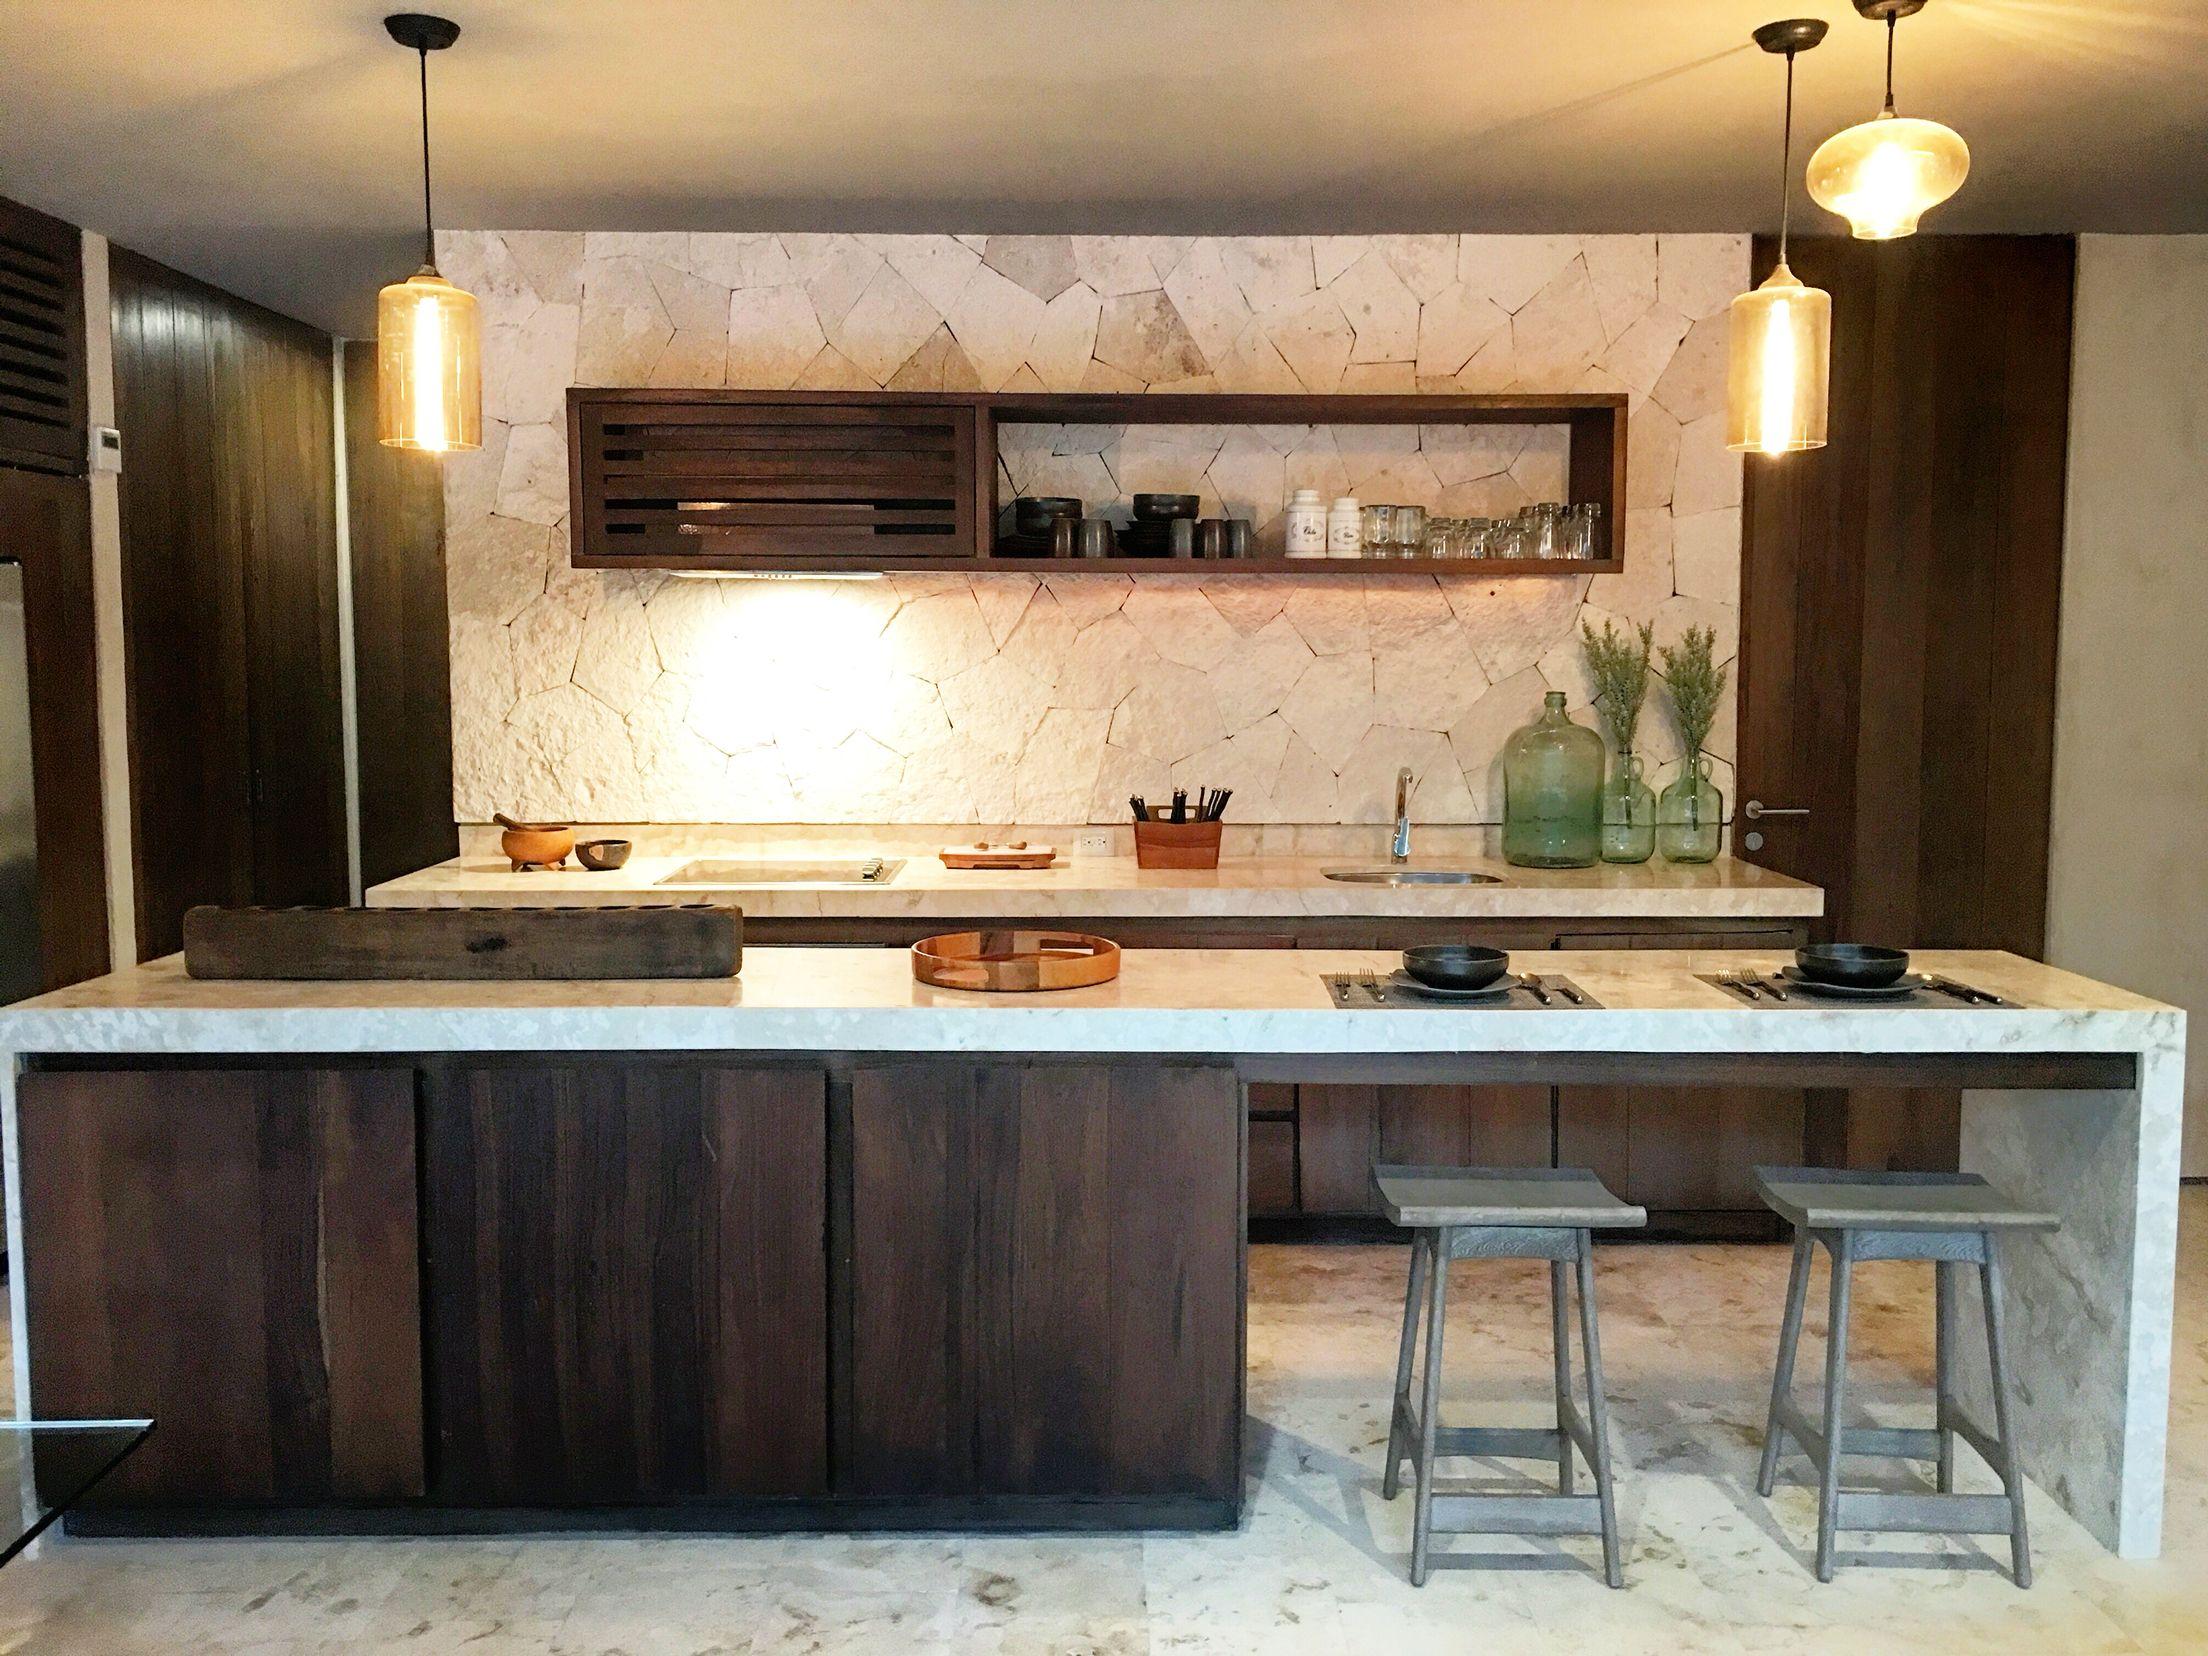 Tulum In 2020 Tulum Tropical Houses Kitchen